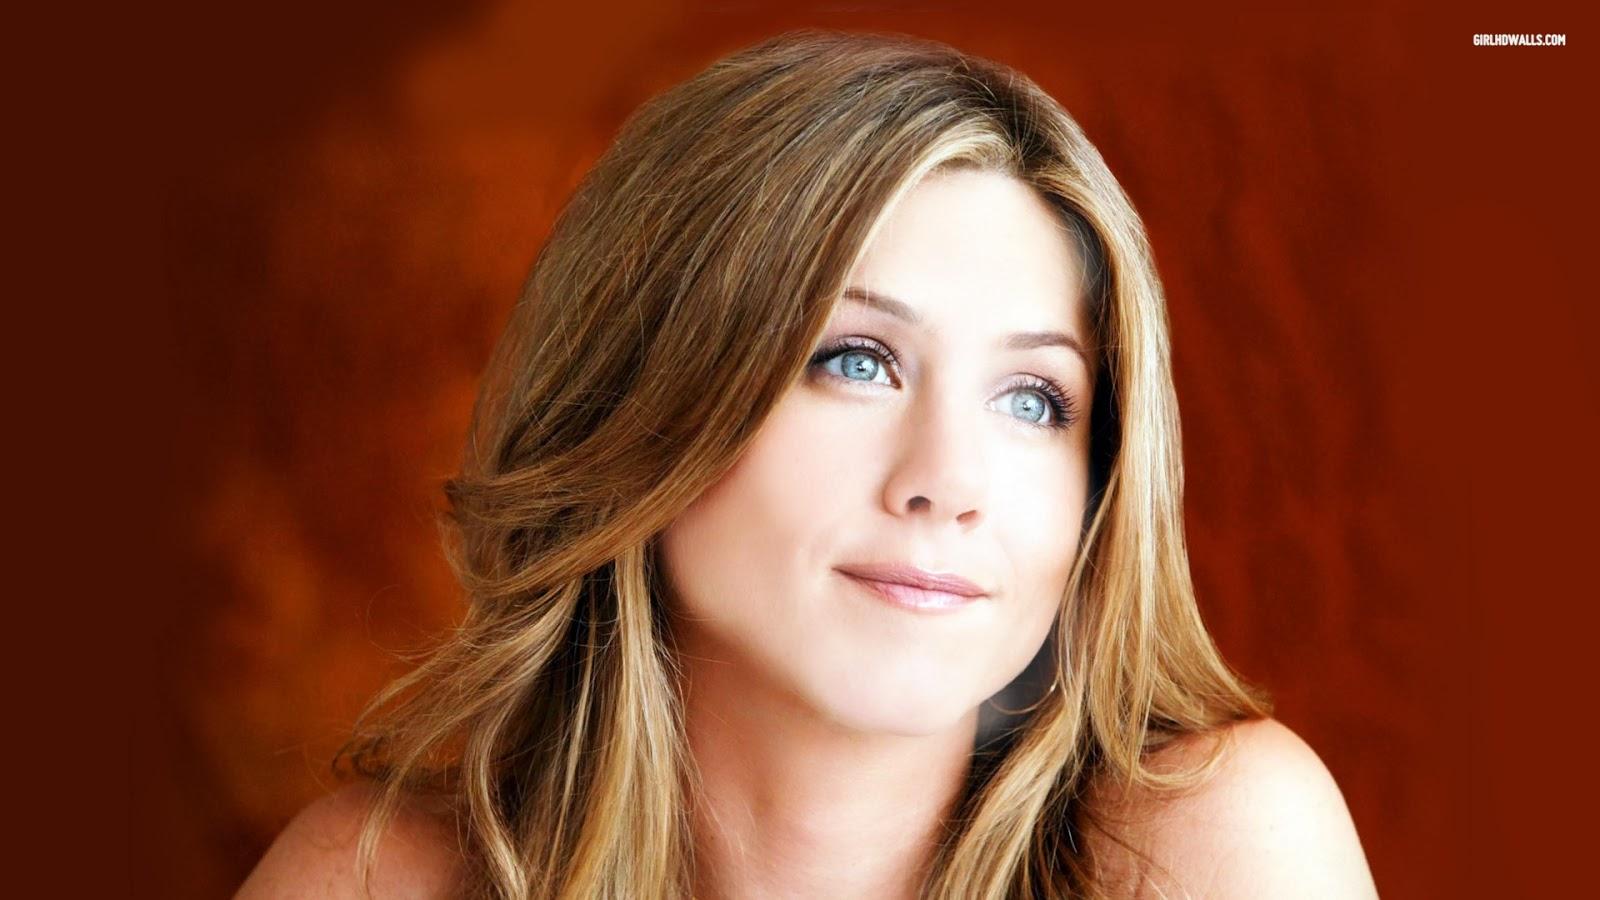 Actress Jennifer Aniston Hot Hd Images  Hot Celebrity-8391